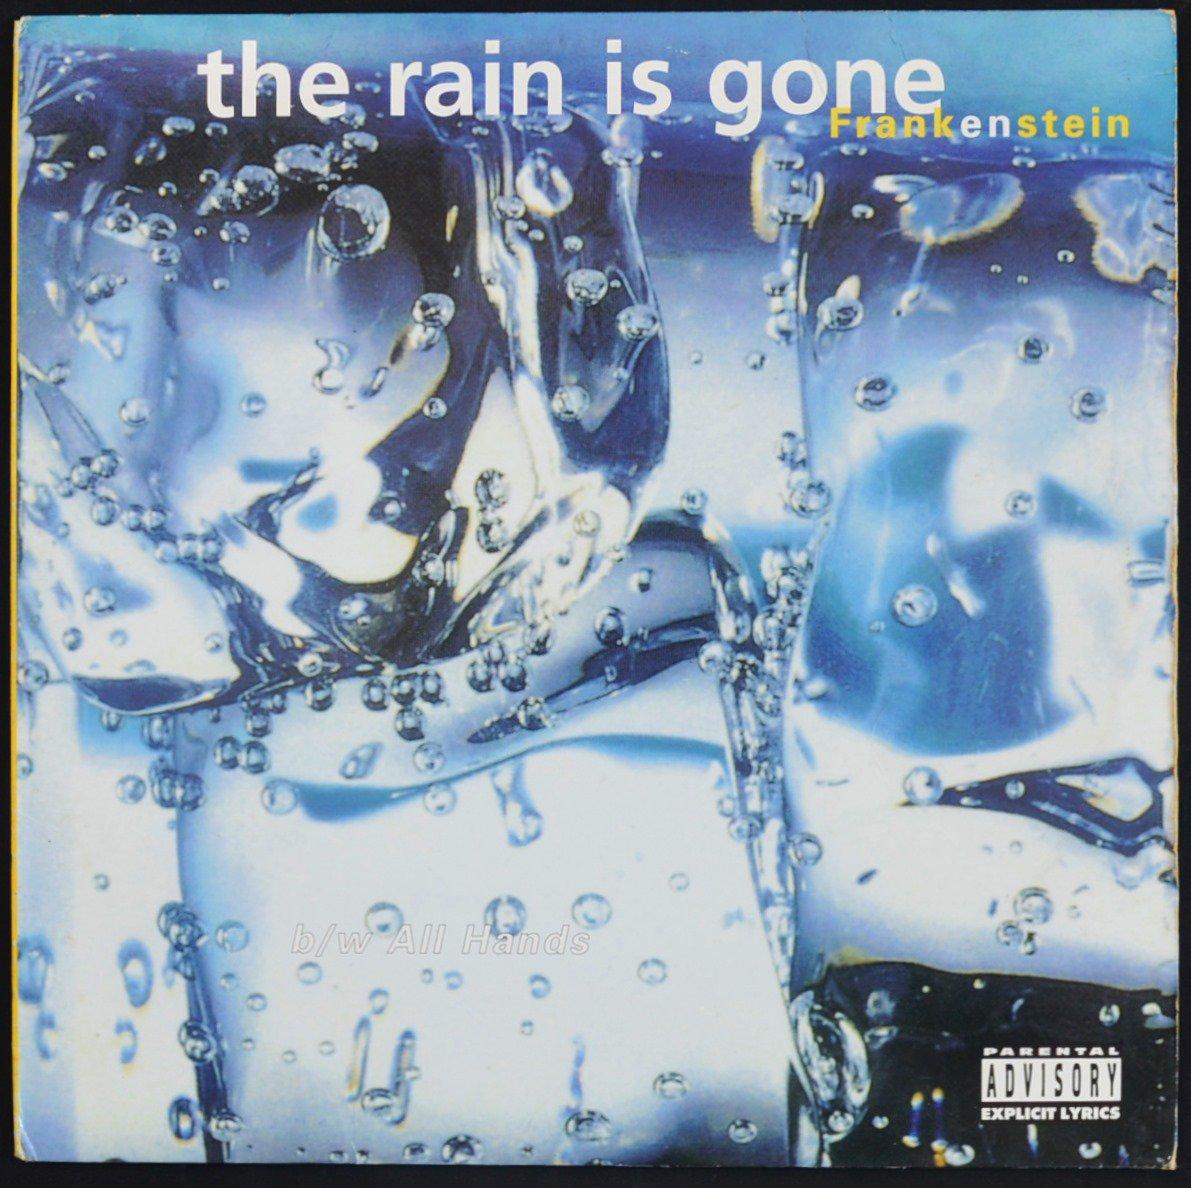 FRANKENSTEIN / THE RAIN IS GONE / ALL HANDS (12